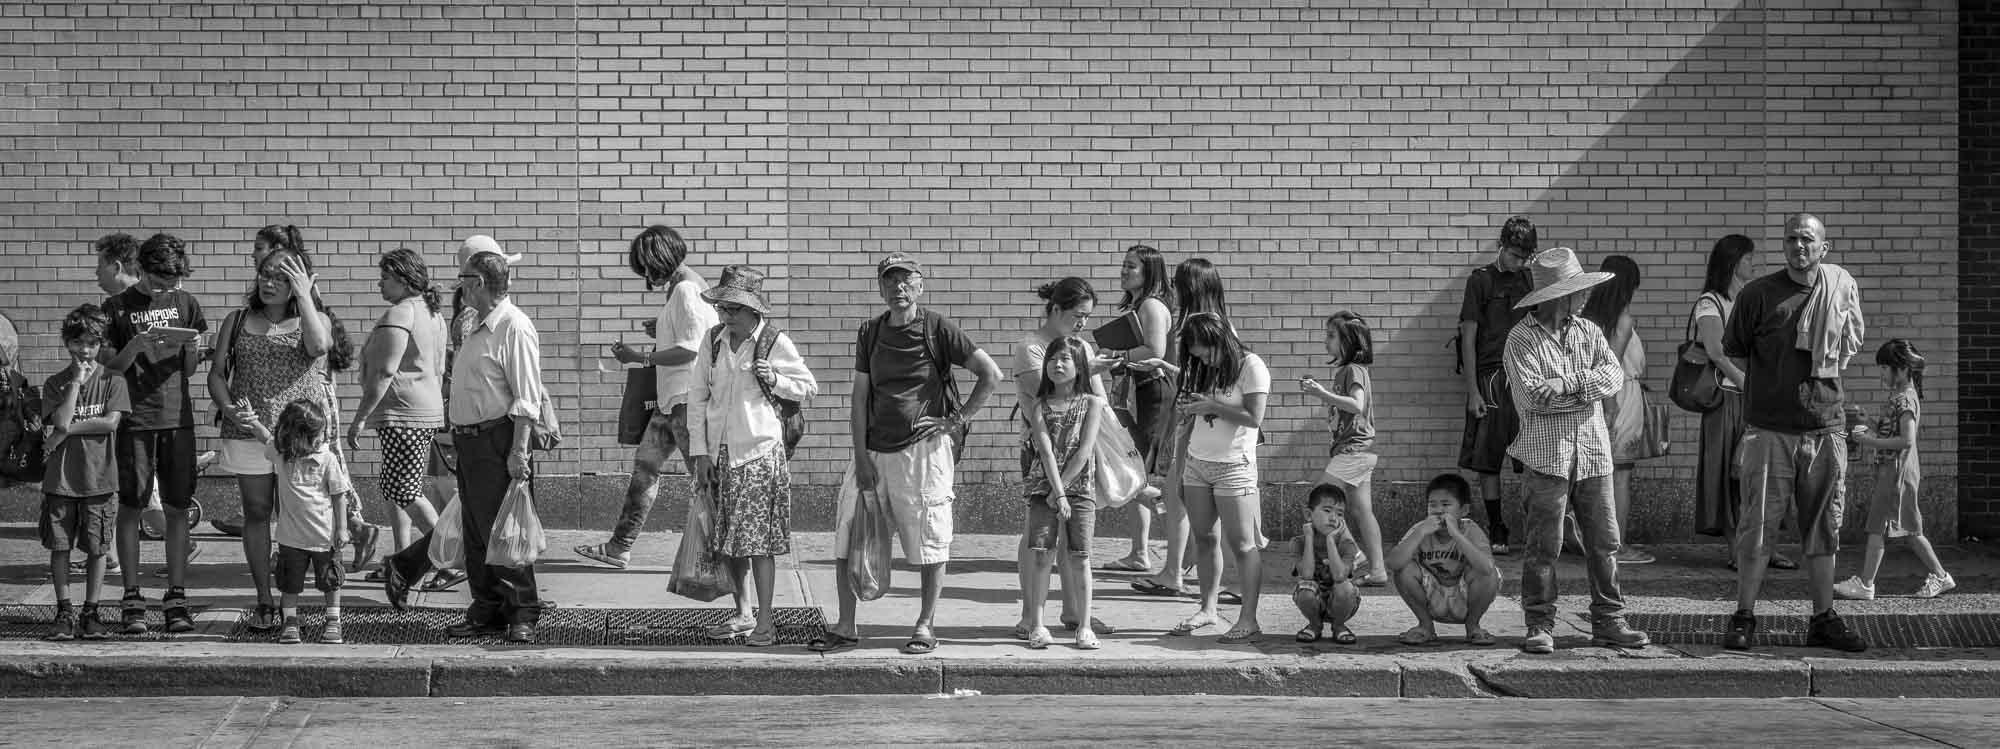 street-photogrphy-romney-15.JPG